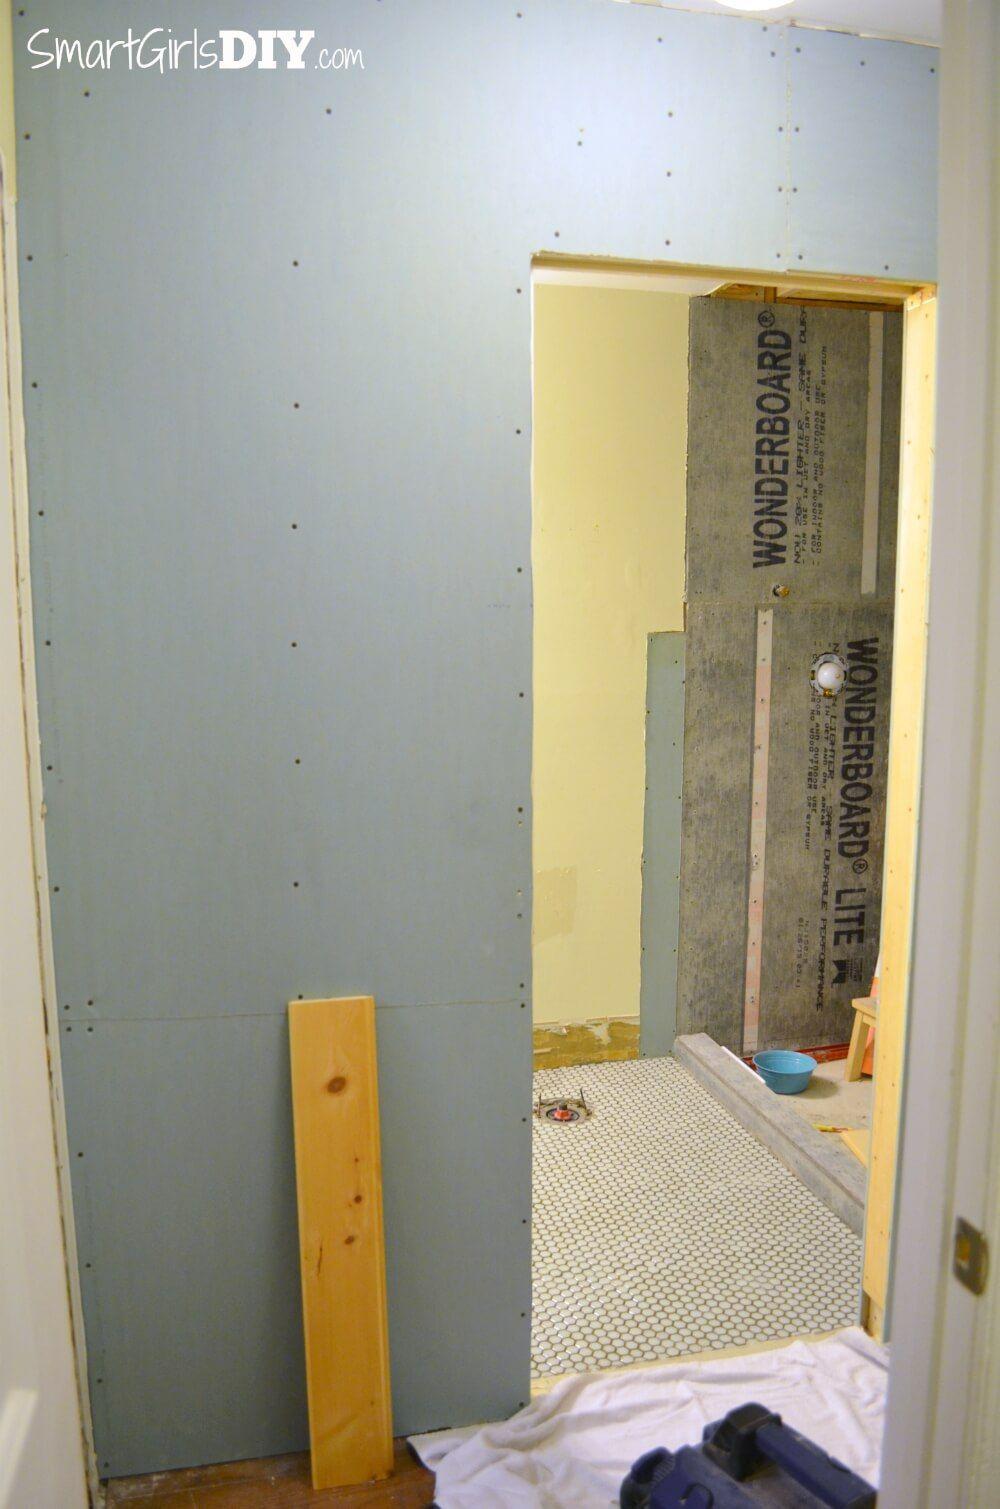 Add Drywall After Installing Pocket Door Tutorial By Smart Girls